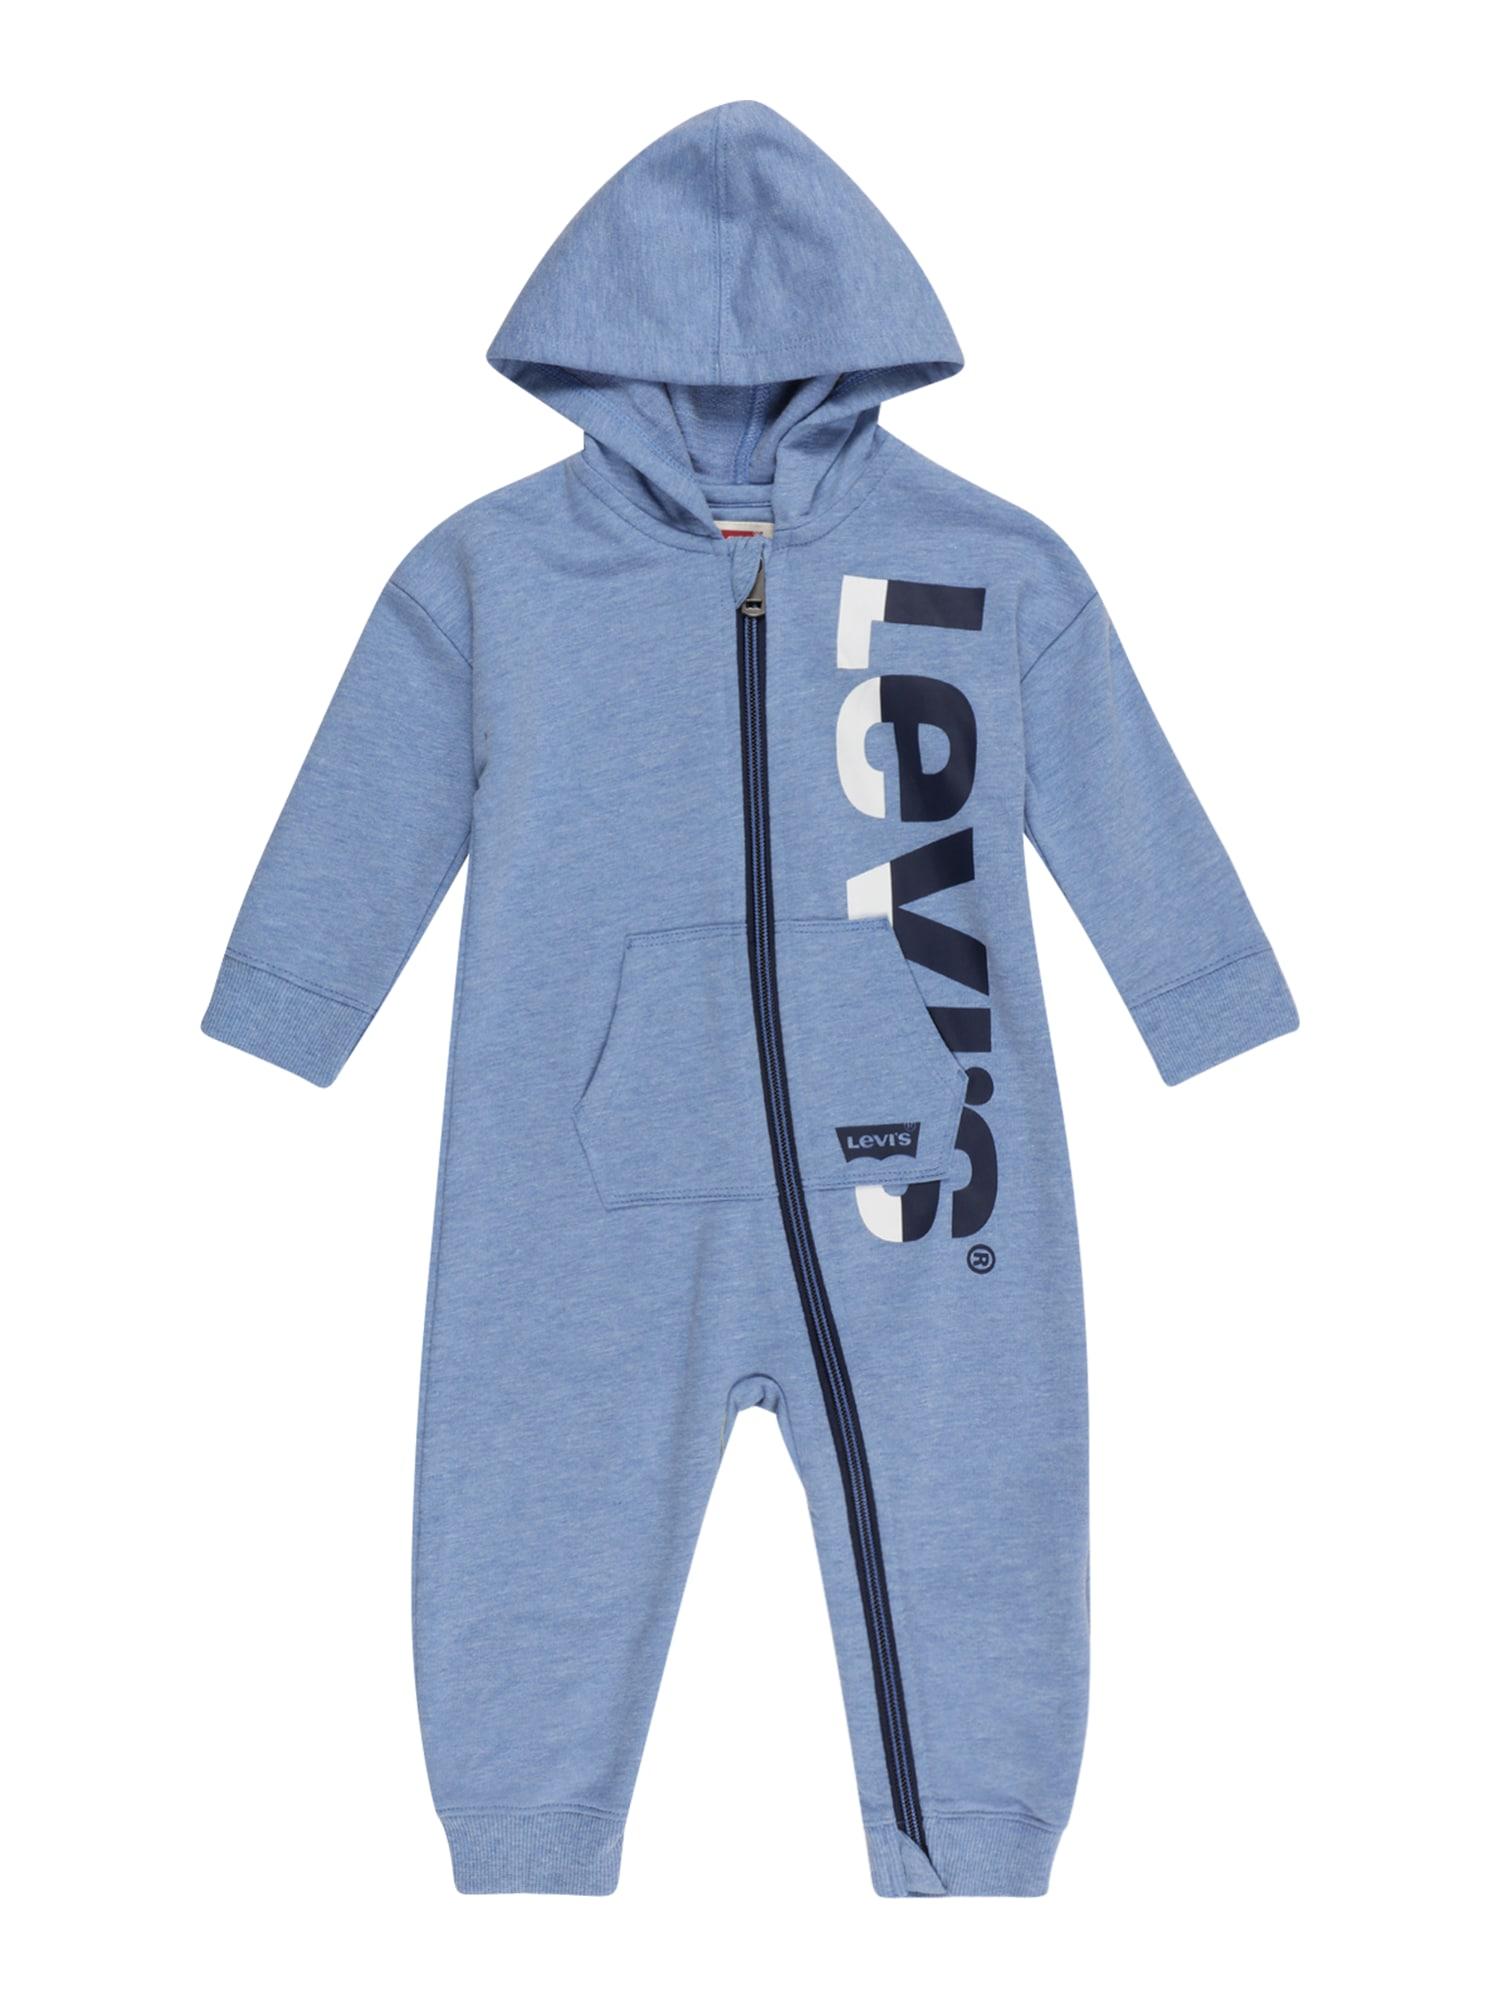 LEVI'S Overal 'PLAY ALL DAY'  kouřově modrá / marine modrá / bílá